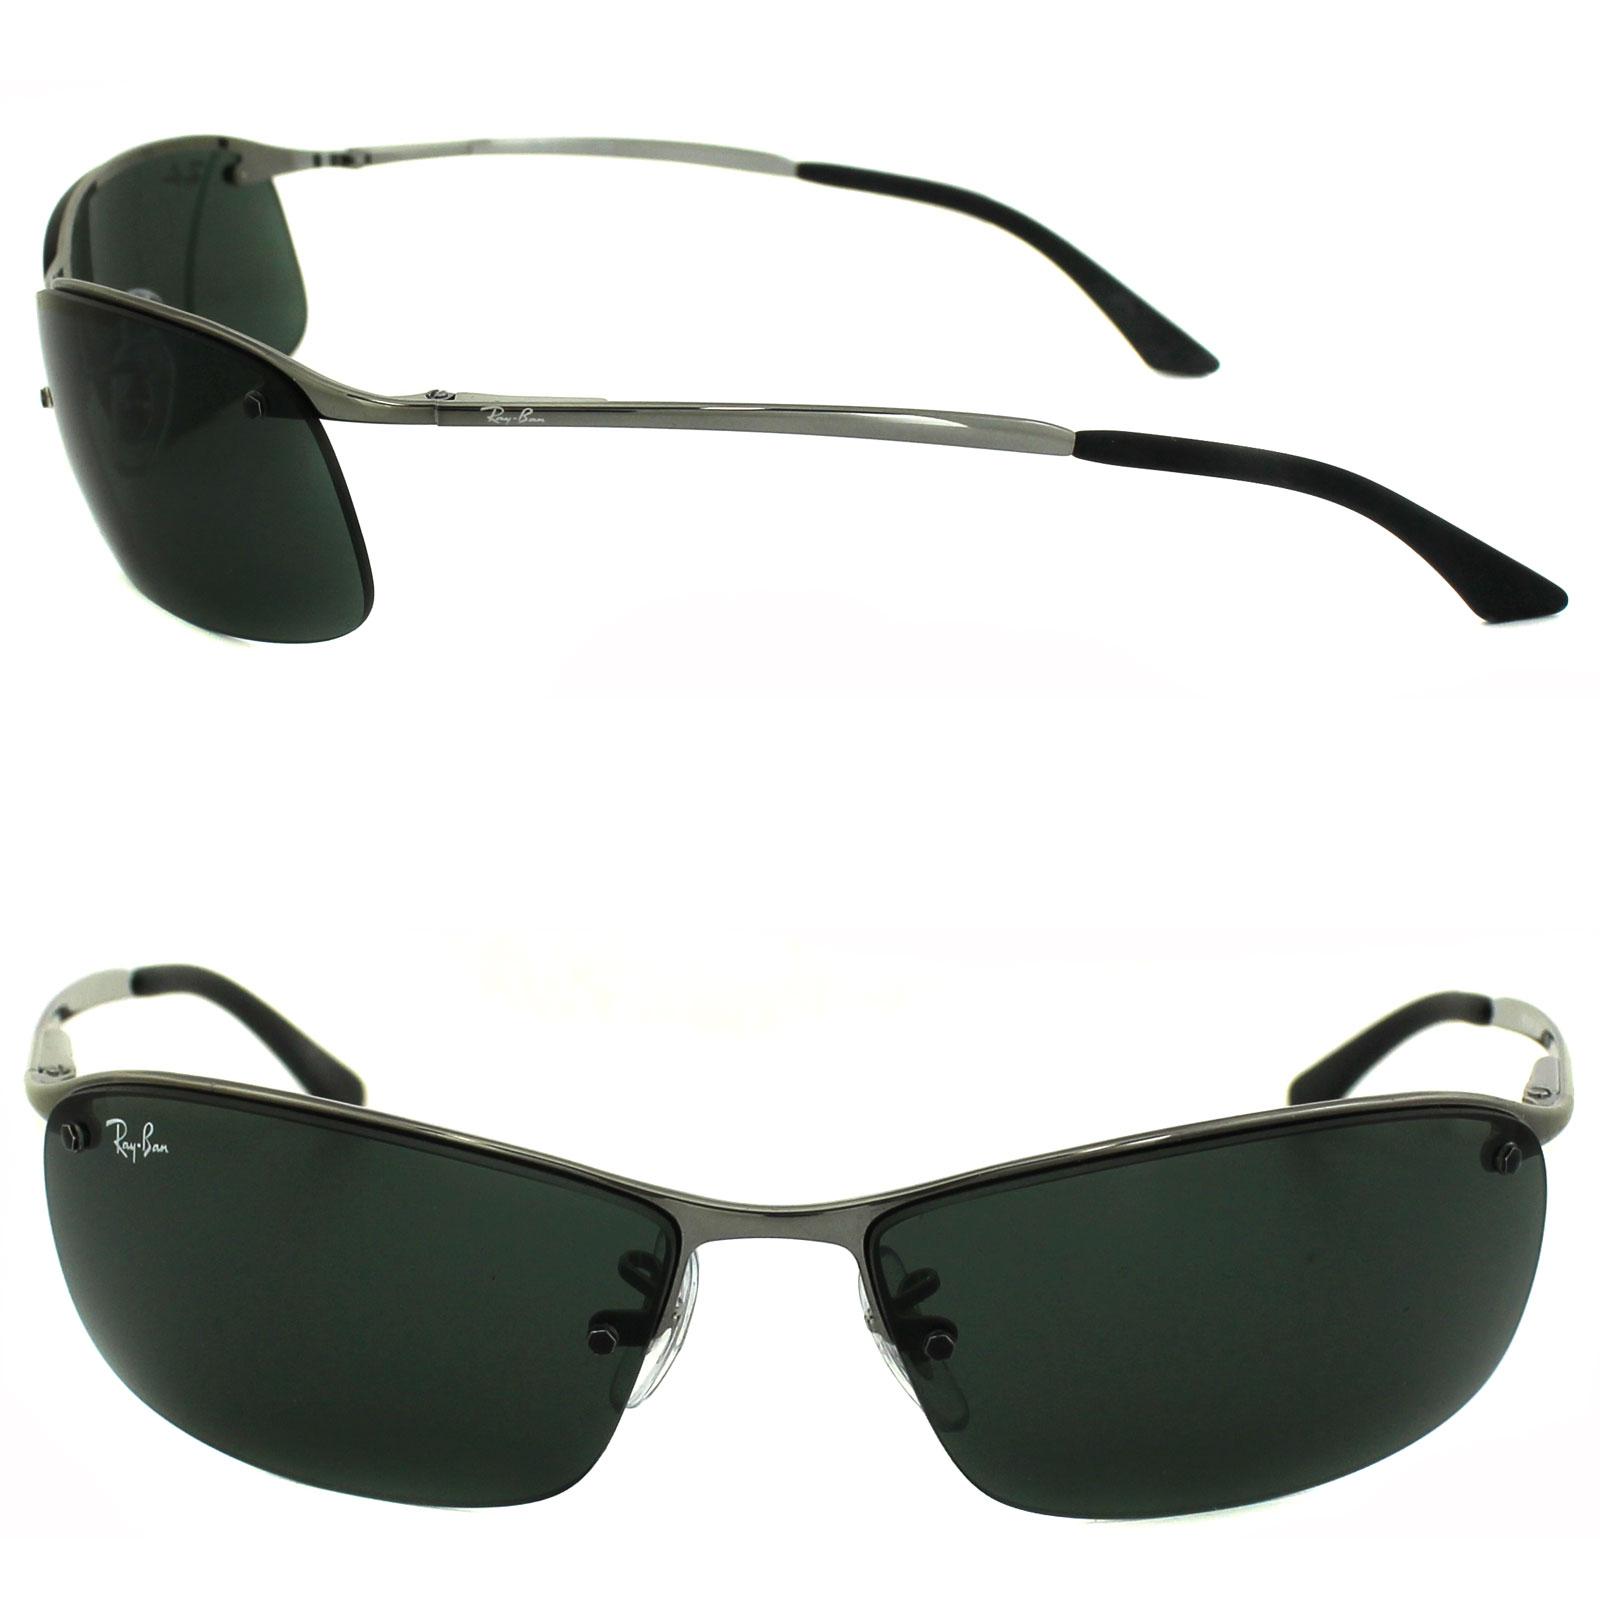 8c9bbb8e59fd Rayban Sunglasses 3183 004 71 Gunmetal Green 805289018919